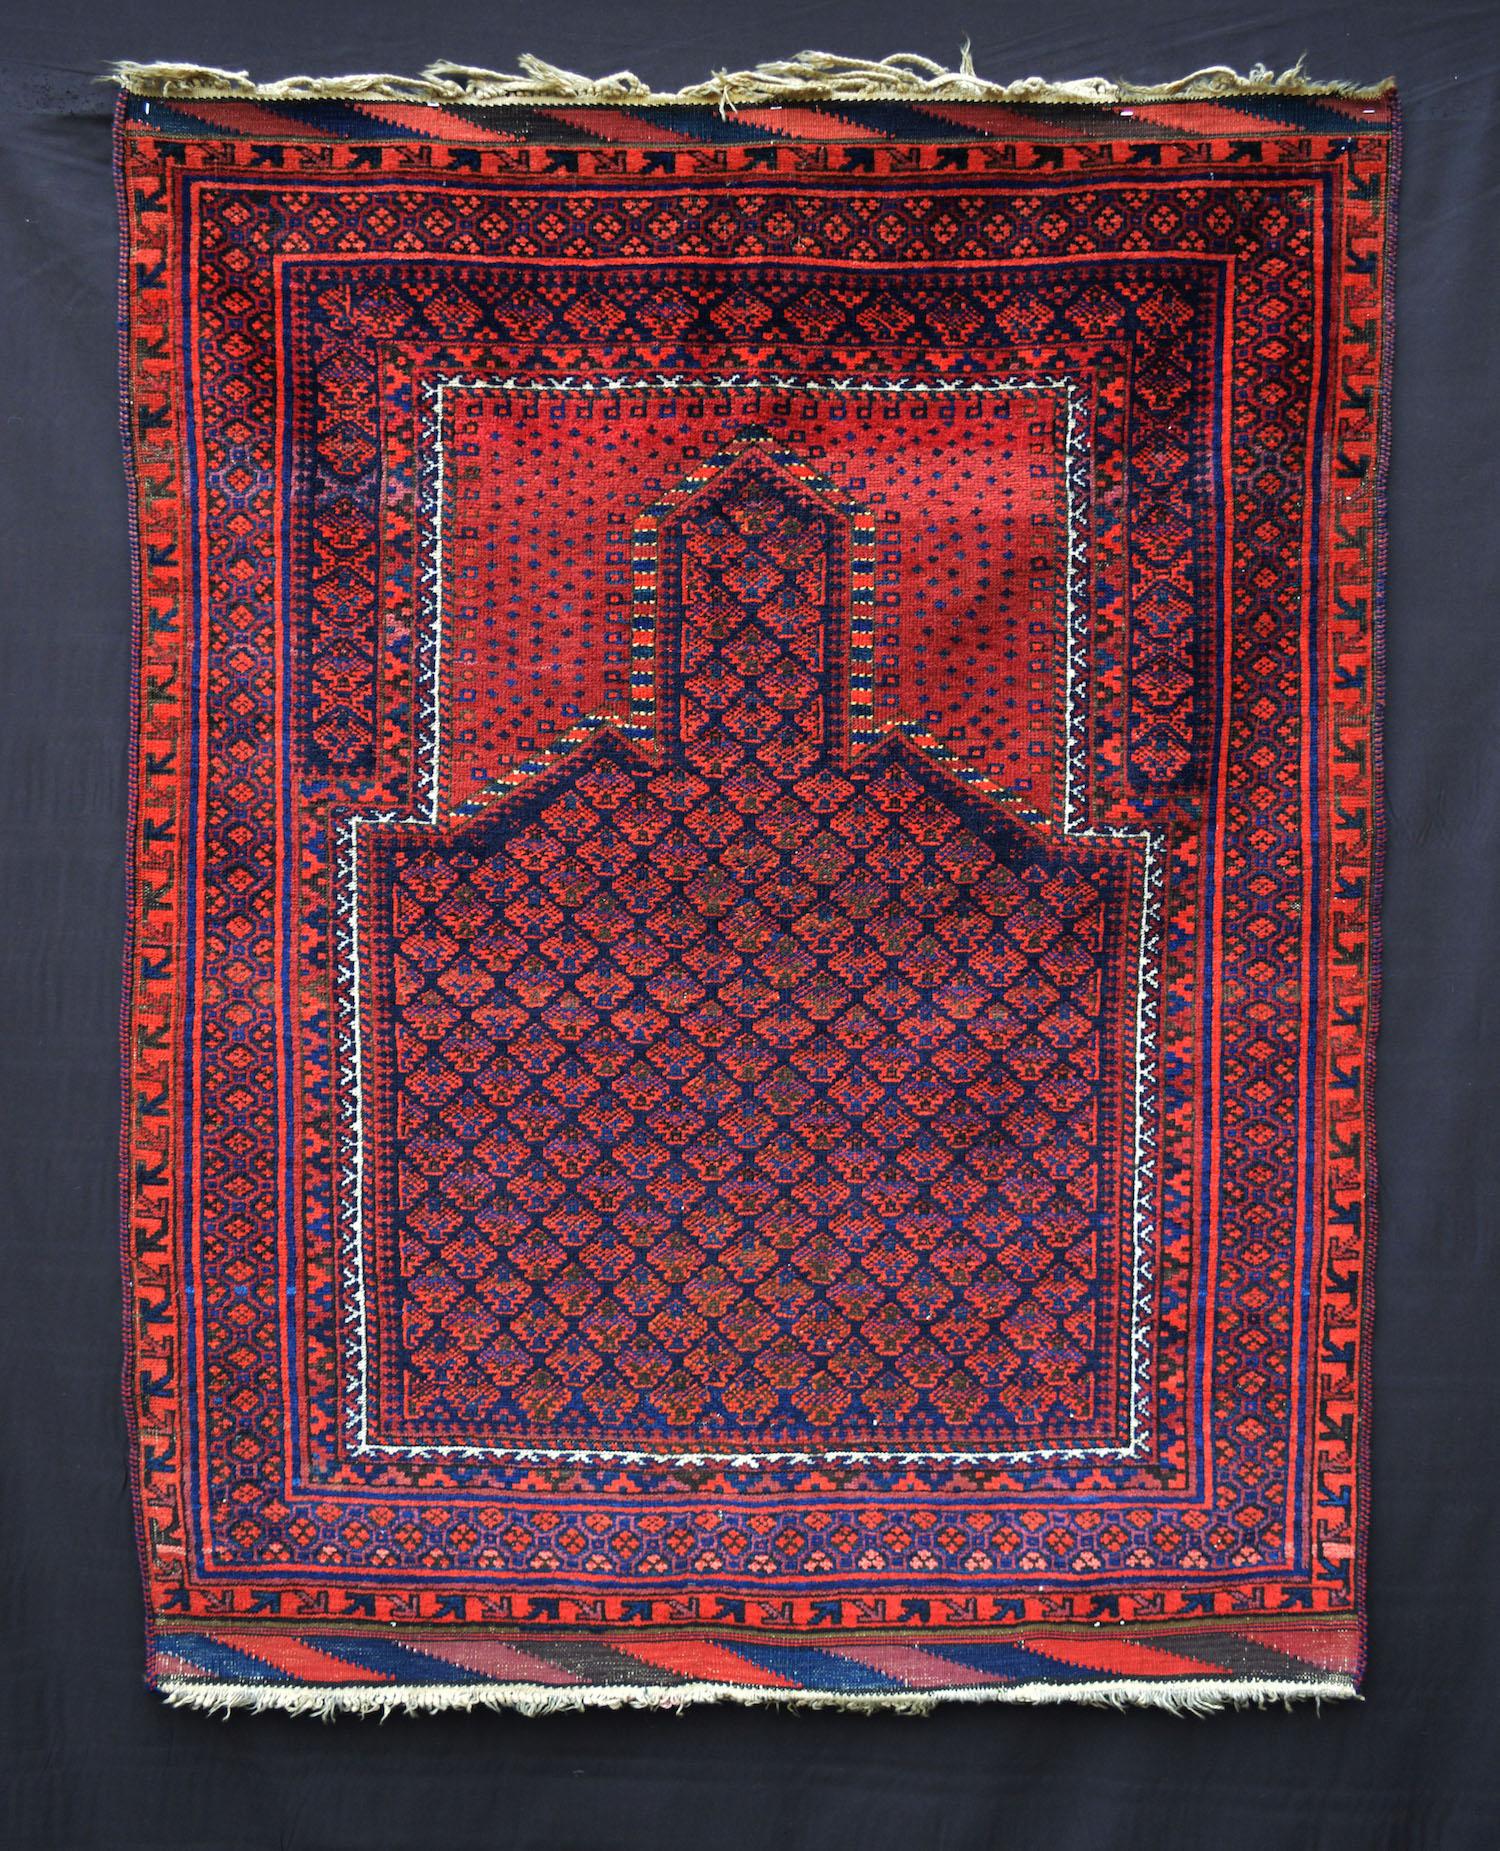 Timuri – Dokhtar-e-Qazi Prayer-Rug